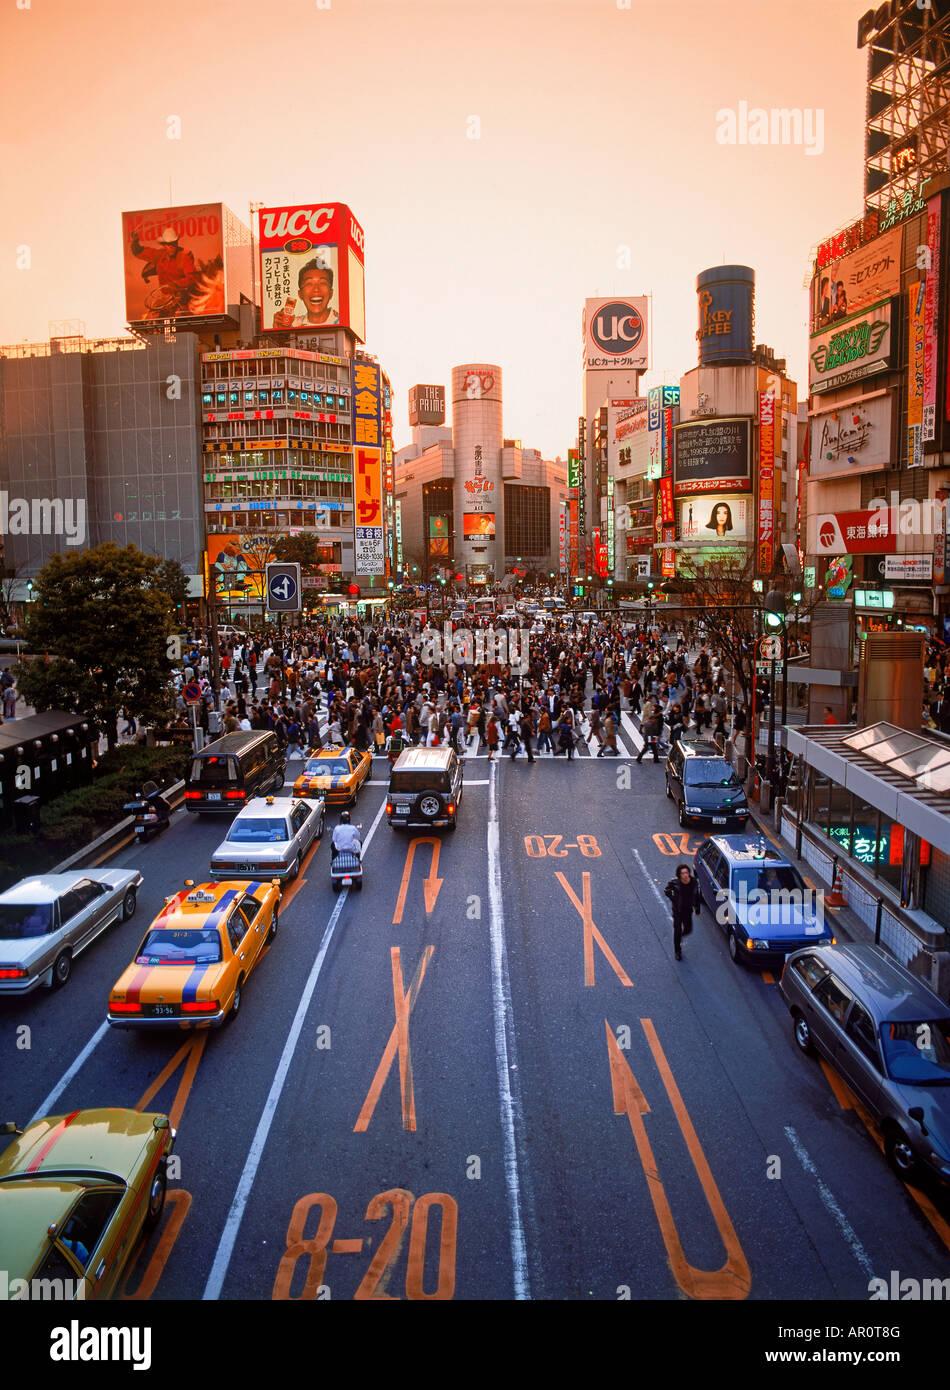 Pedestrians filling crosswalks in Shibuya district of Tokyo Stock Photo